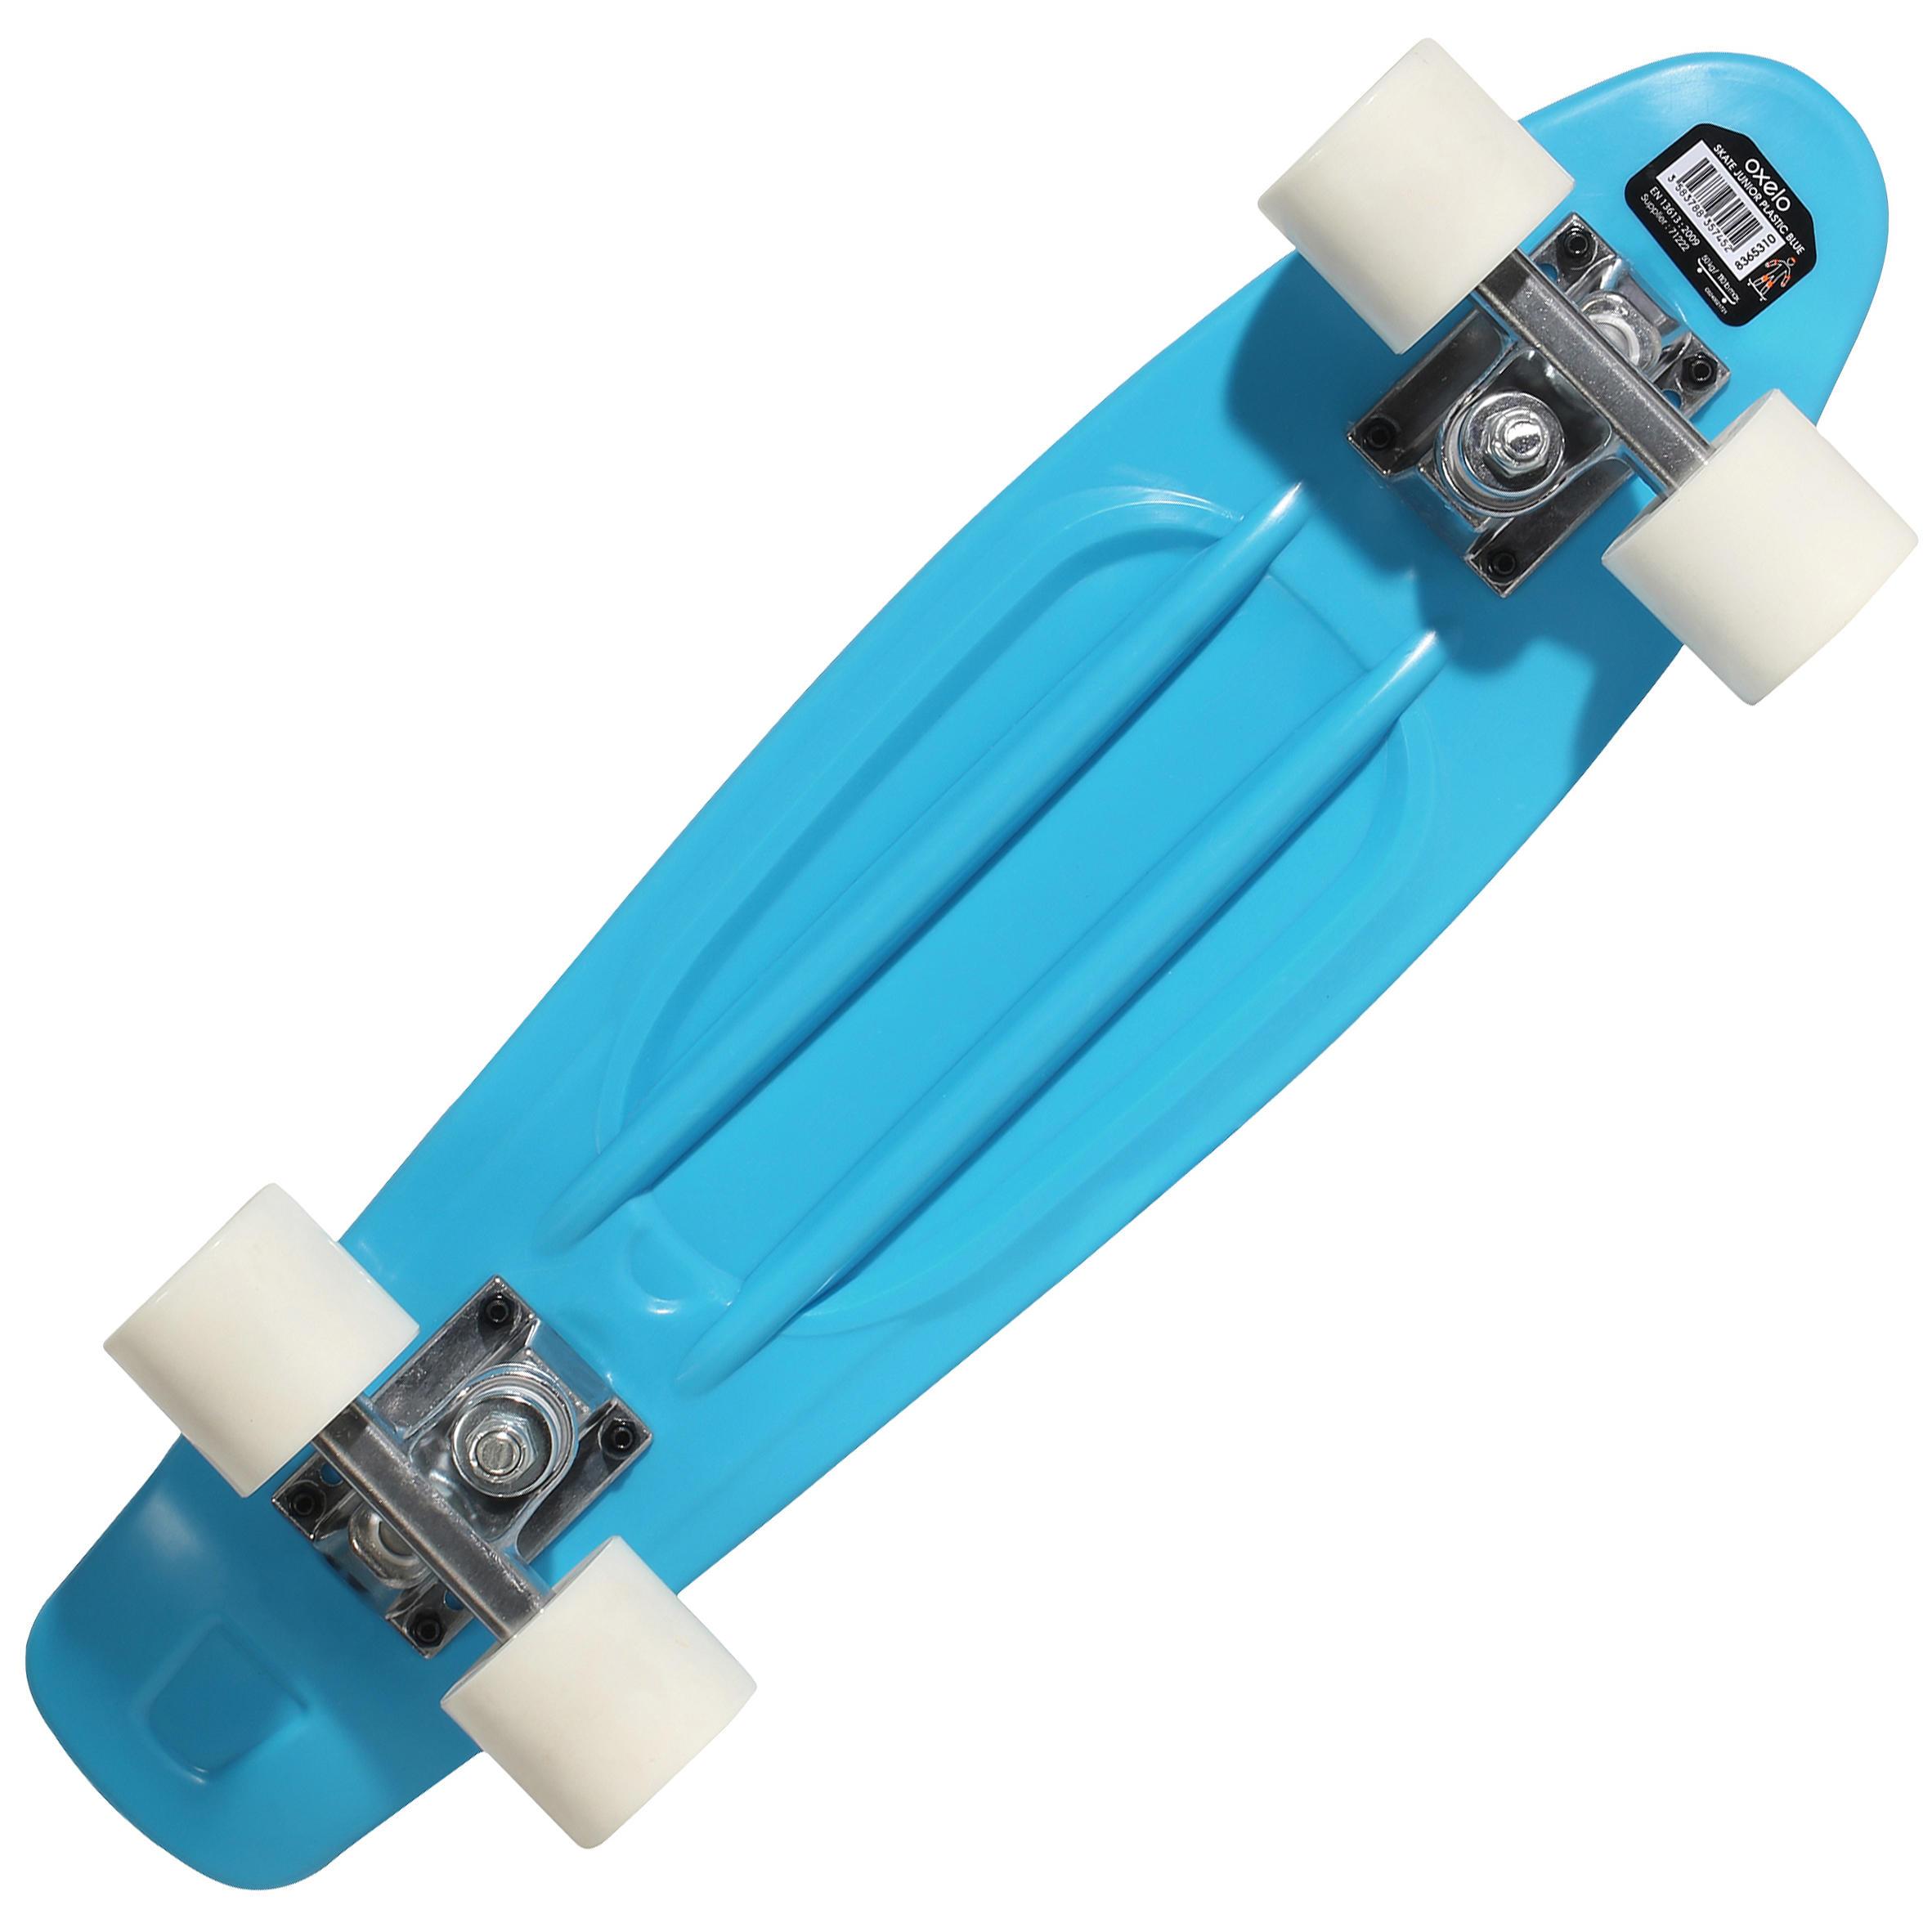 KIDS MINI SKATEBOARD JUNIOR PLASTIC BLUE